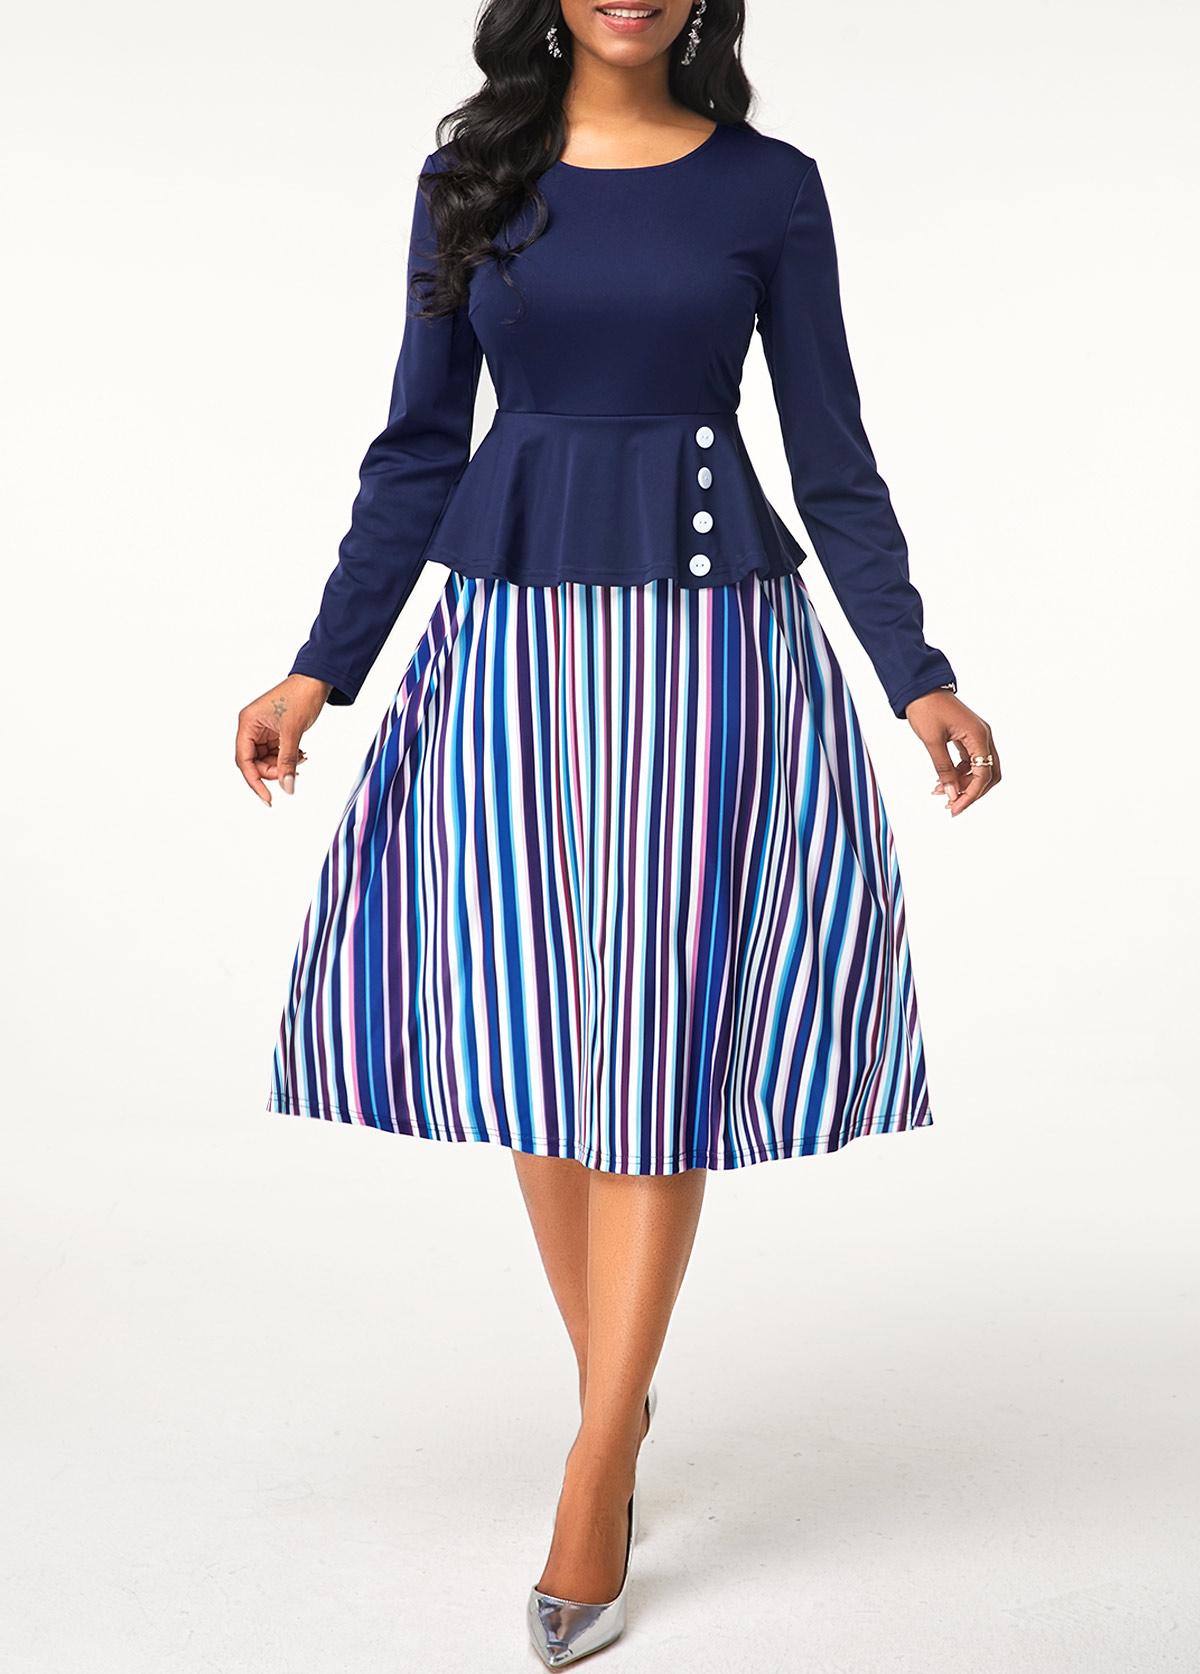 Stripe Print Button Detail Round Neck Dress